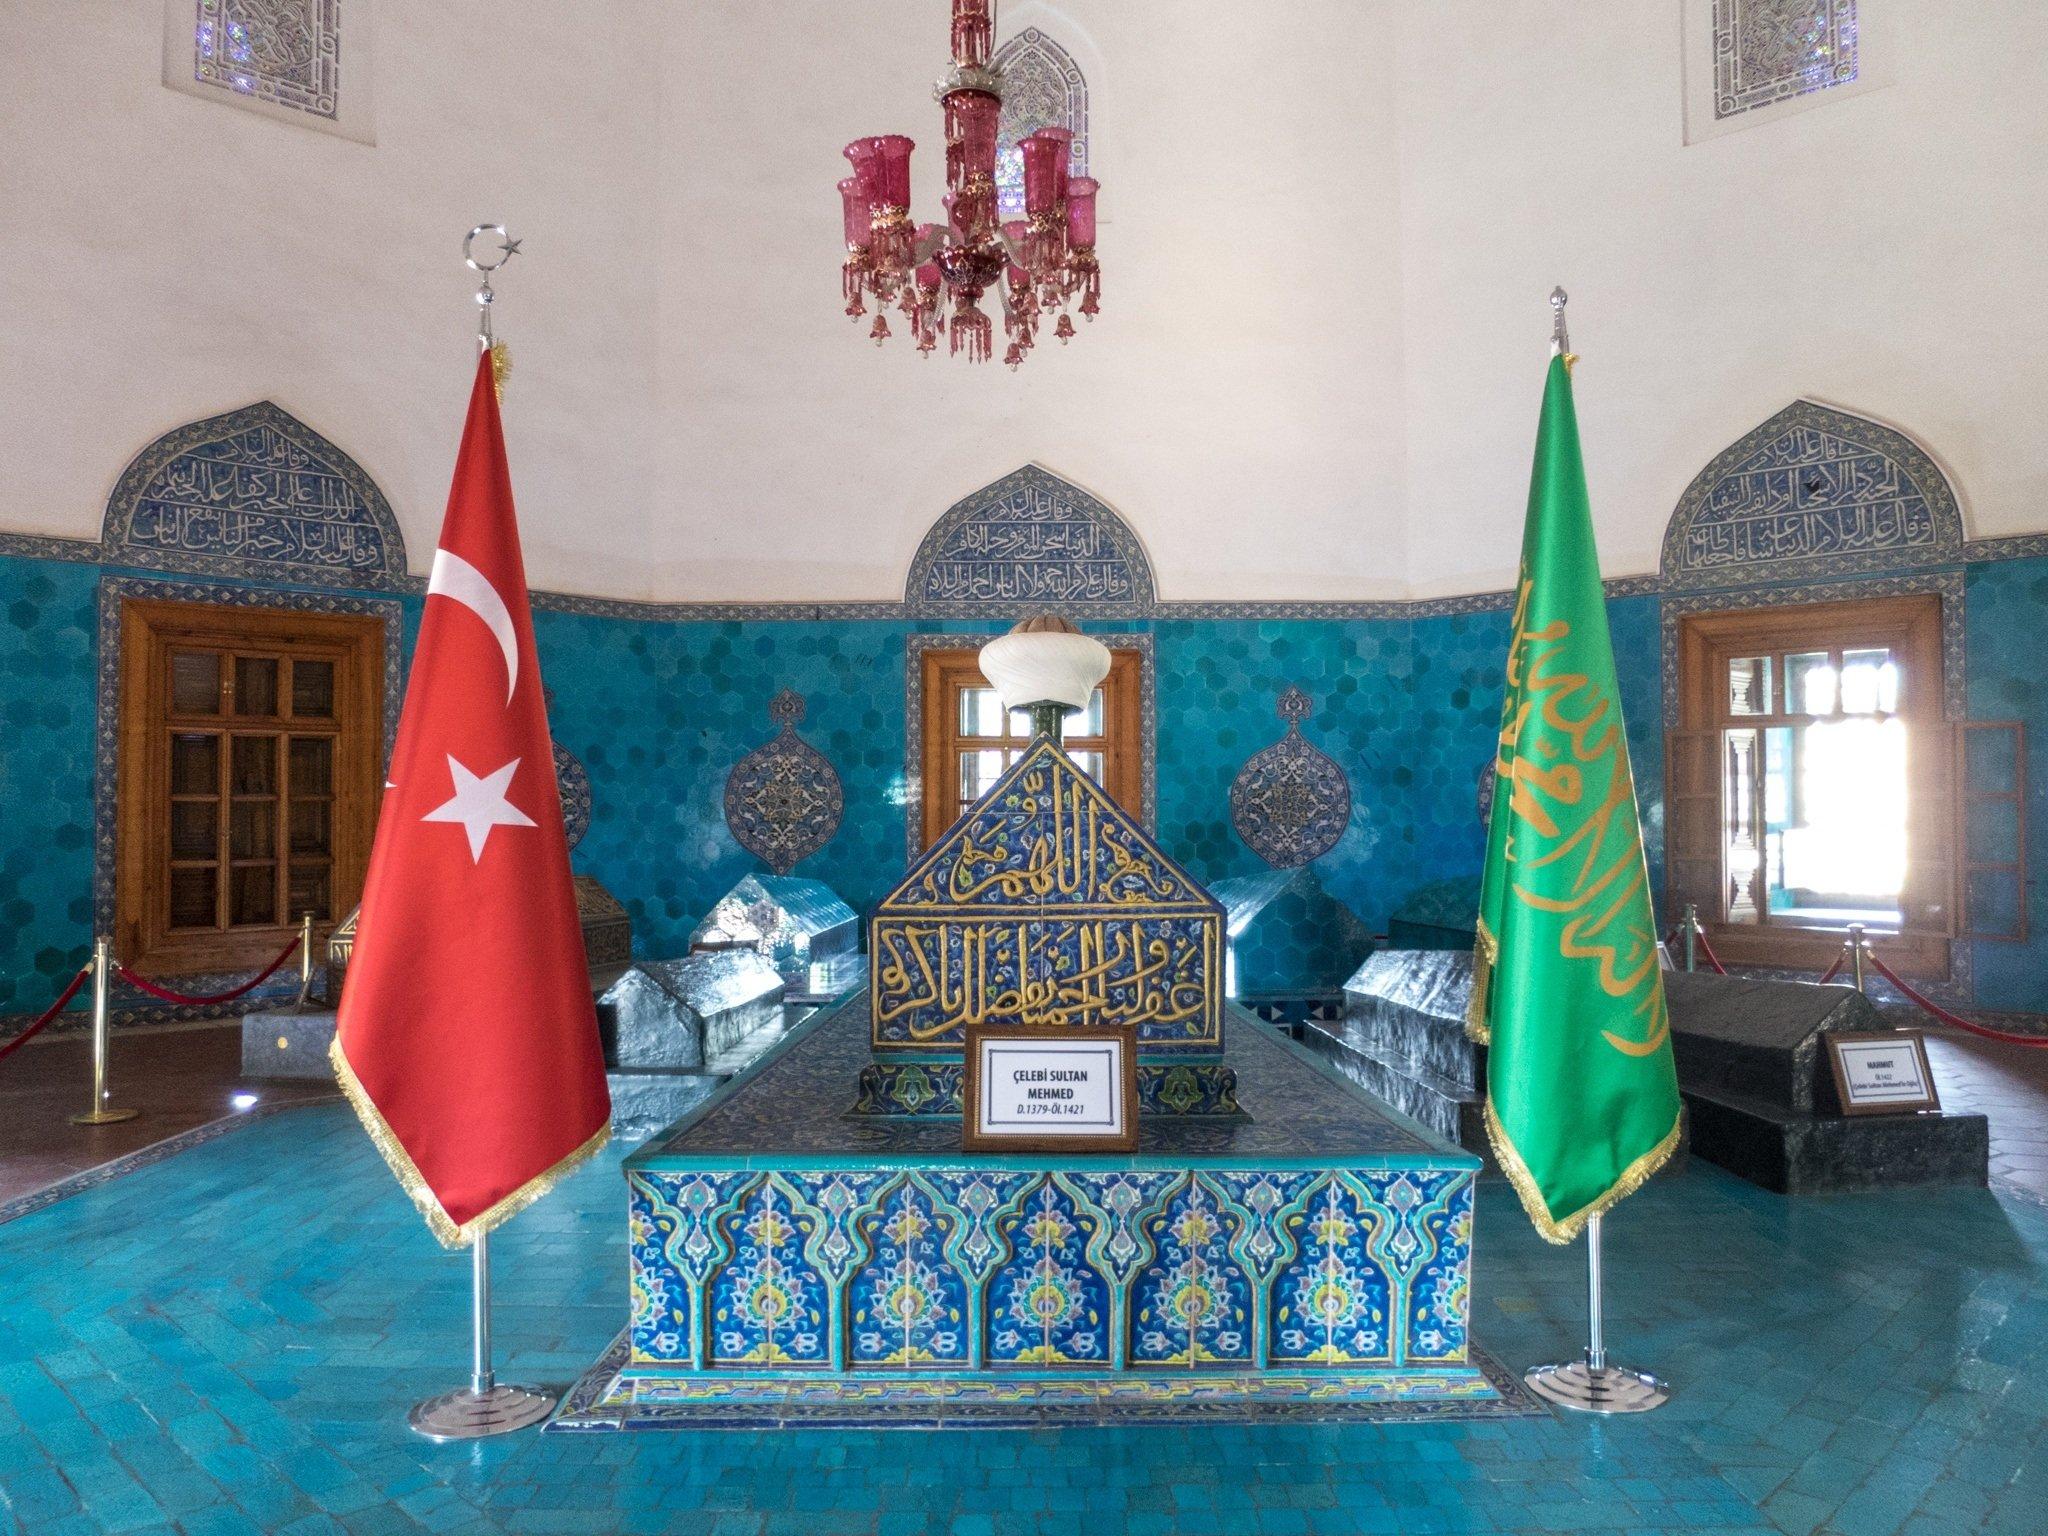 Burial sites inside the Green Tomb in Bursa, Turkey.